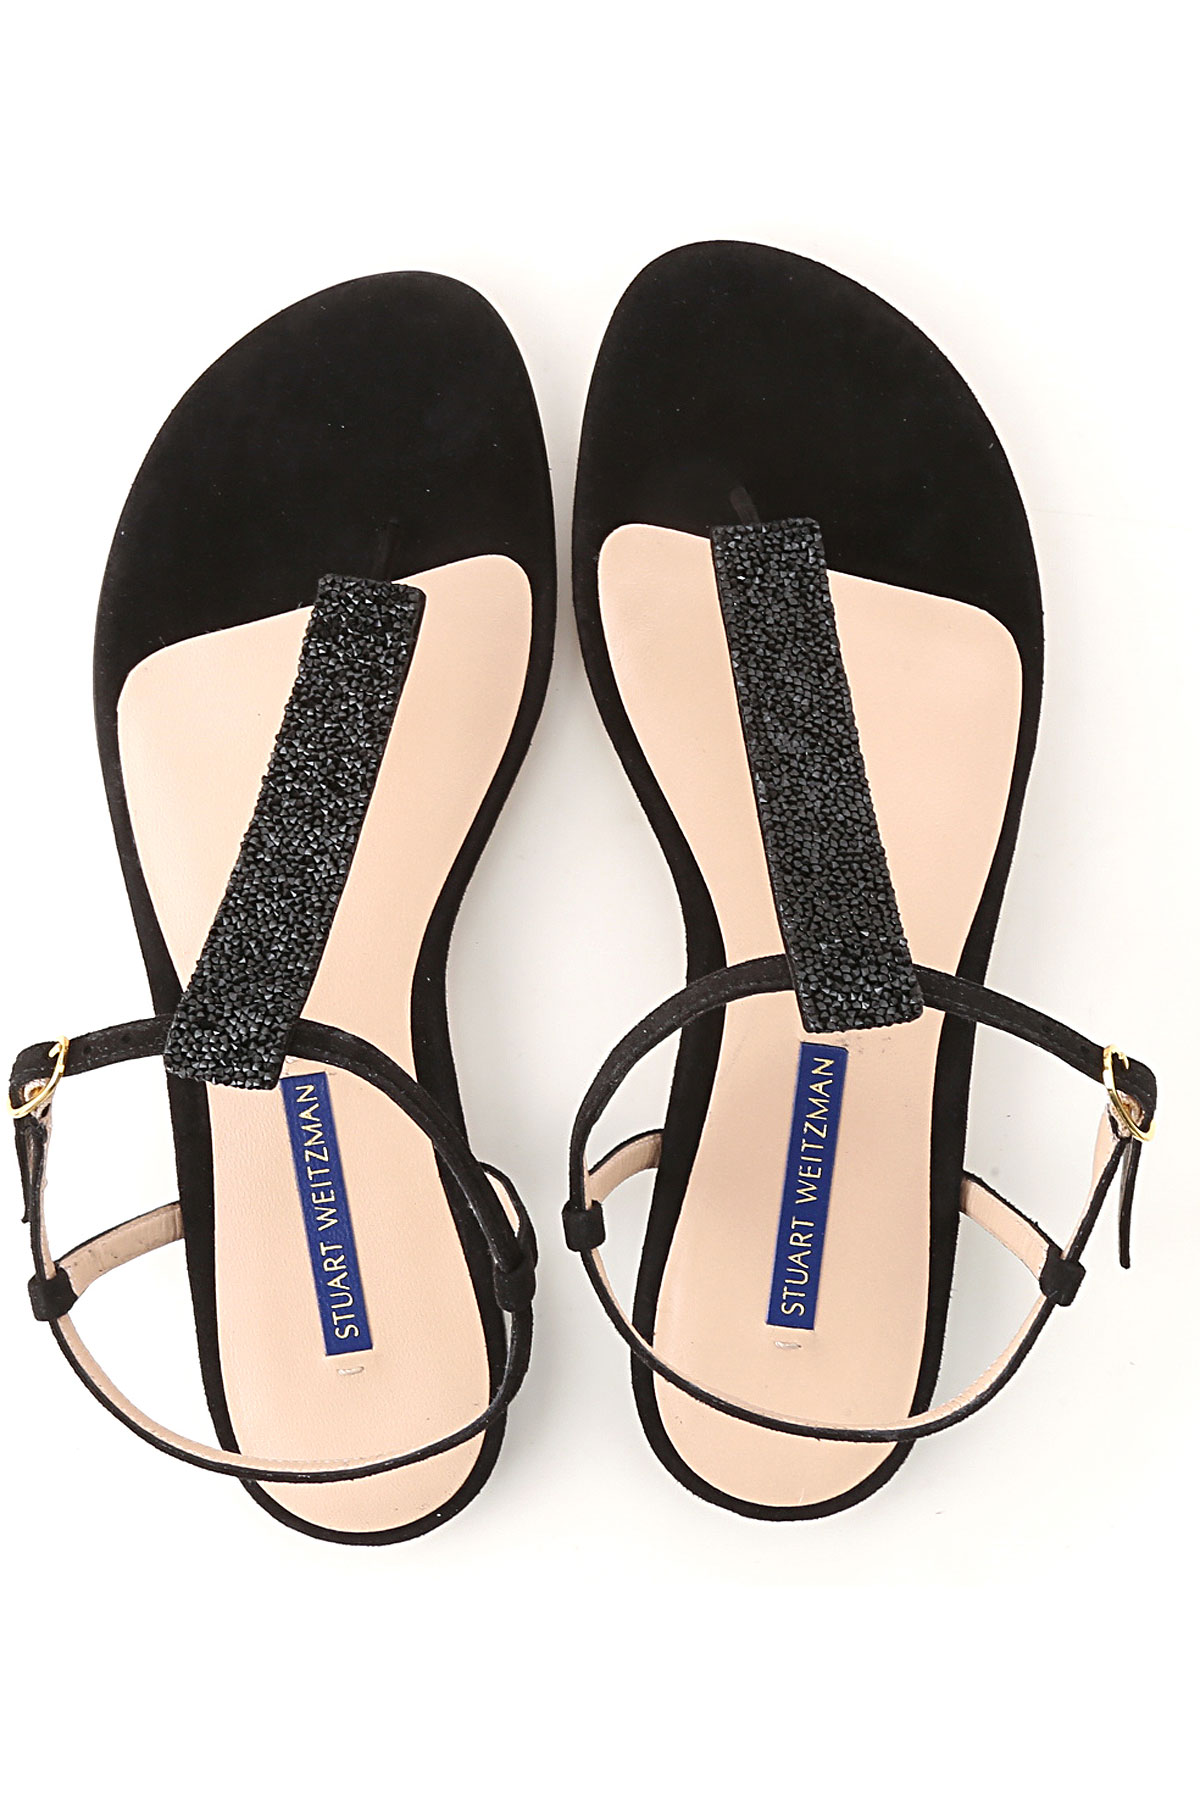 Mujer Stuart Para Weitzman Primavera nbsp; verano Negro 2019 Zapatos qttSxwra